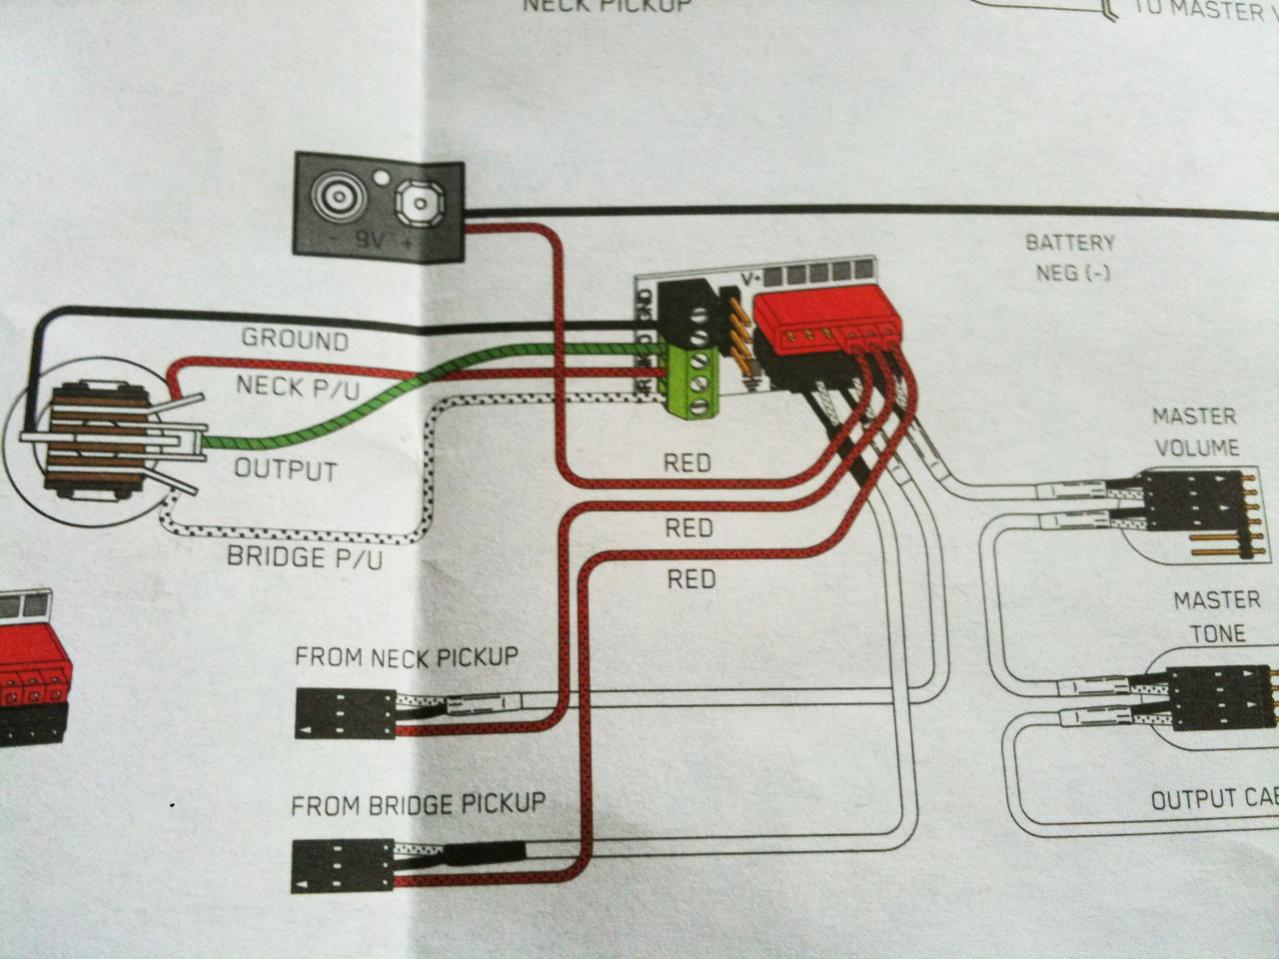 Groß Zwei Humbucker 5 Wege Schalter Fotos - Elektrische Schaltplan ...